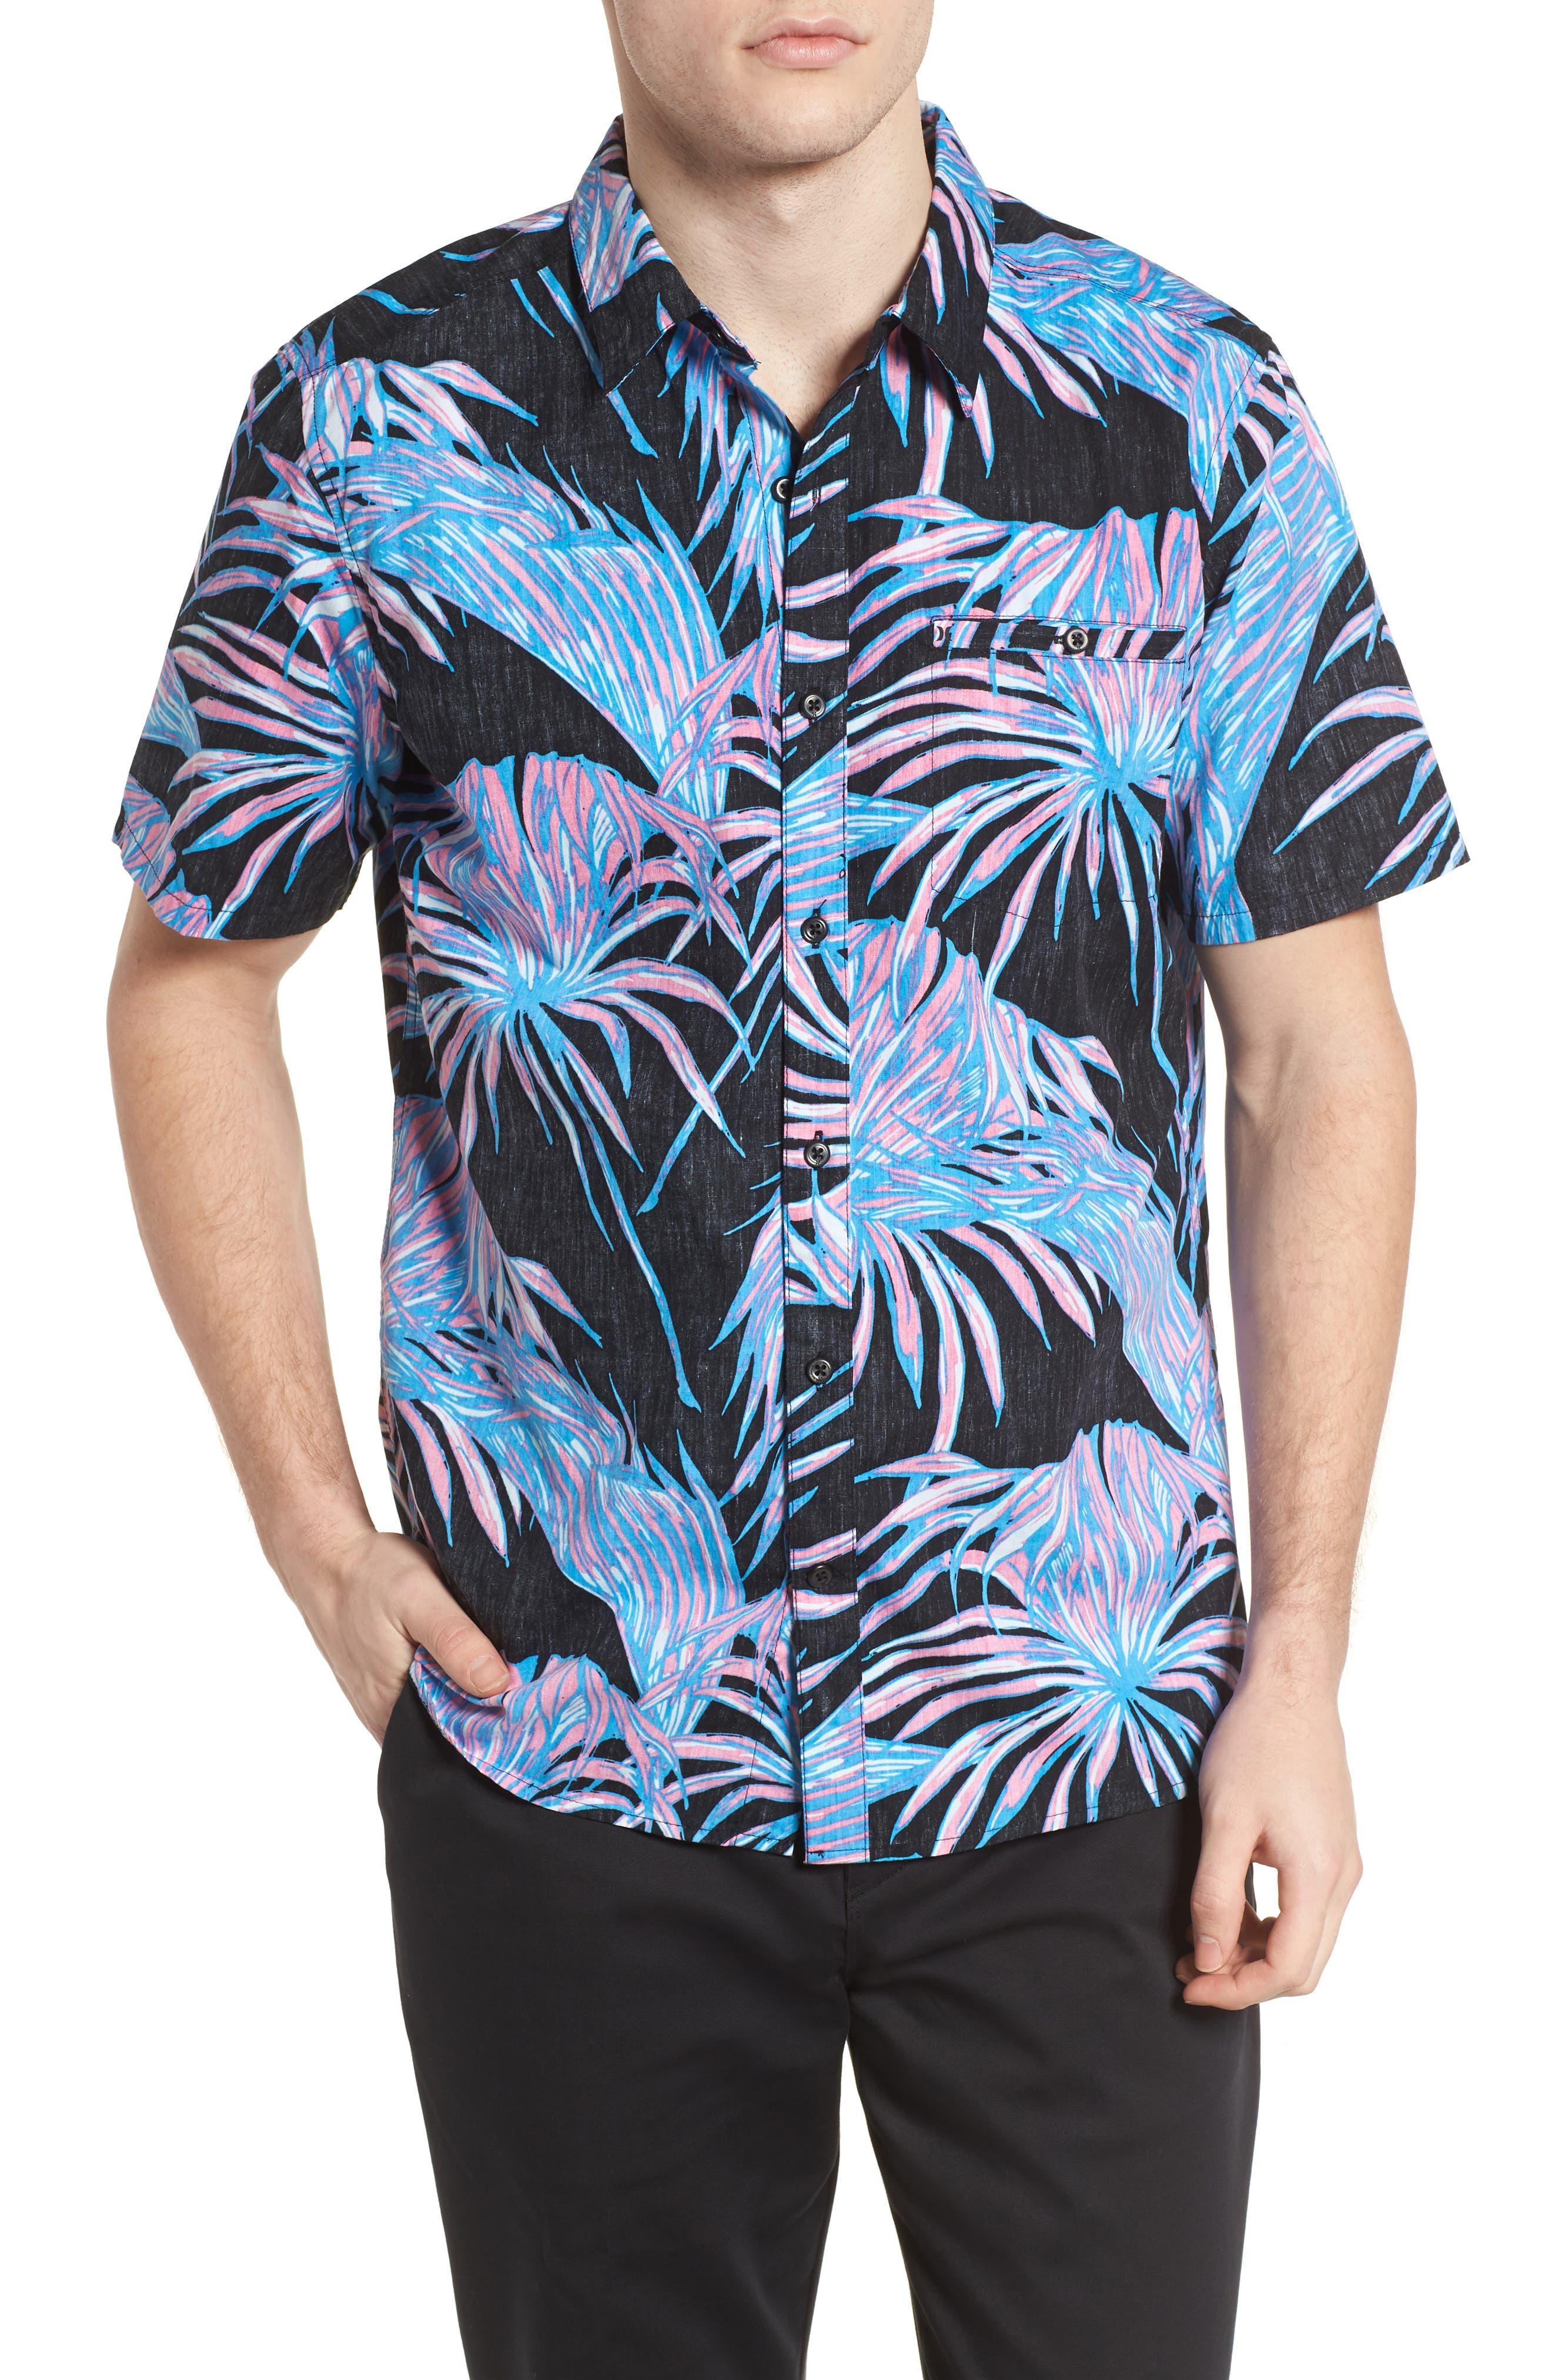 Koko Shirt,                         Main,                         color, Black